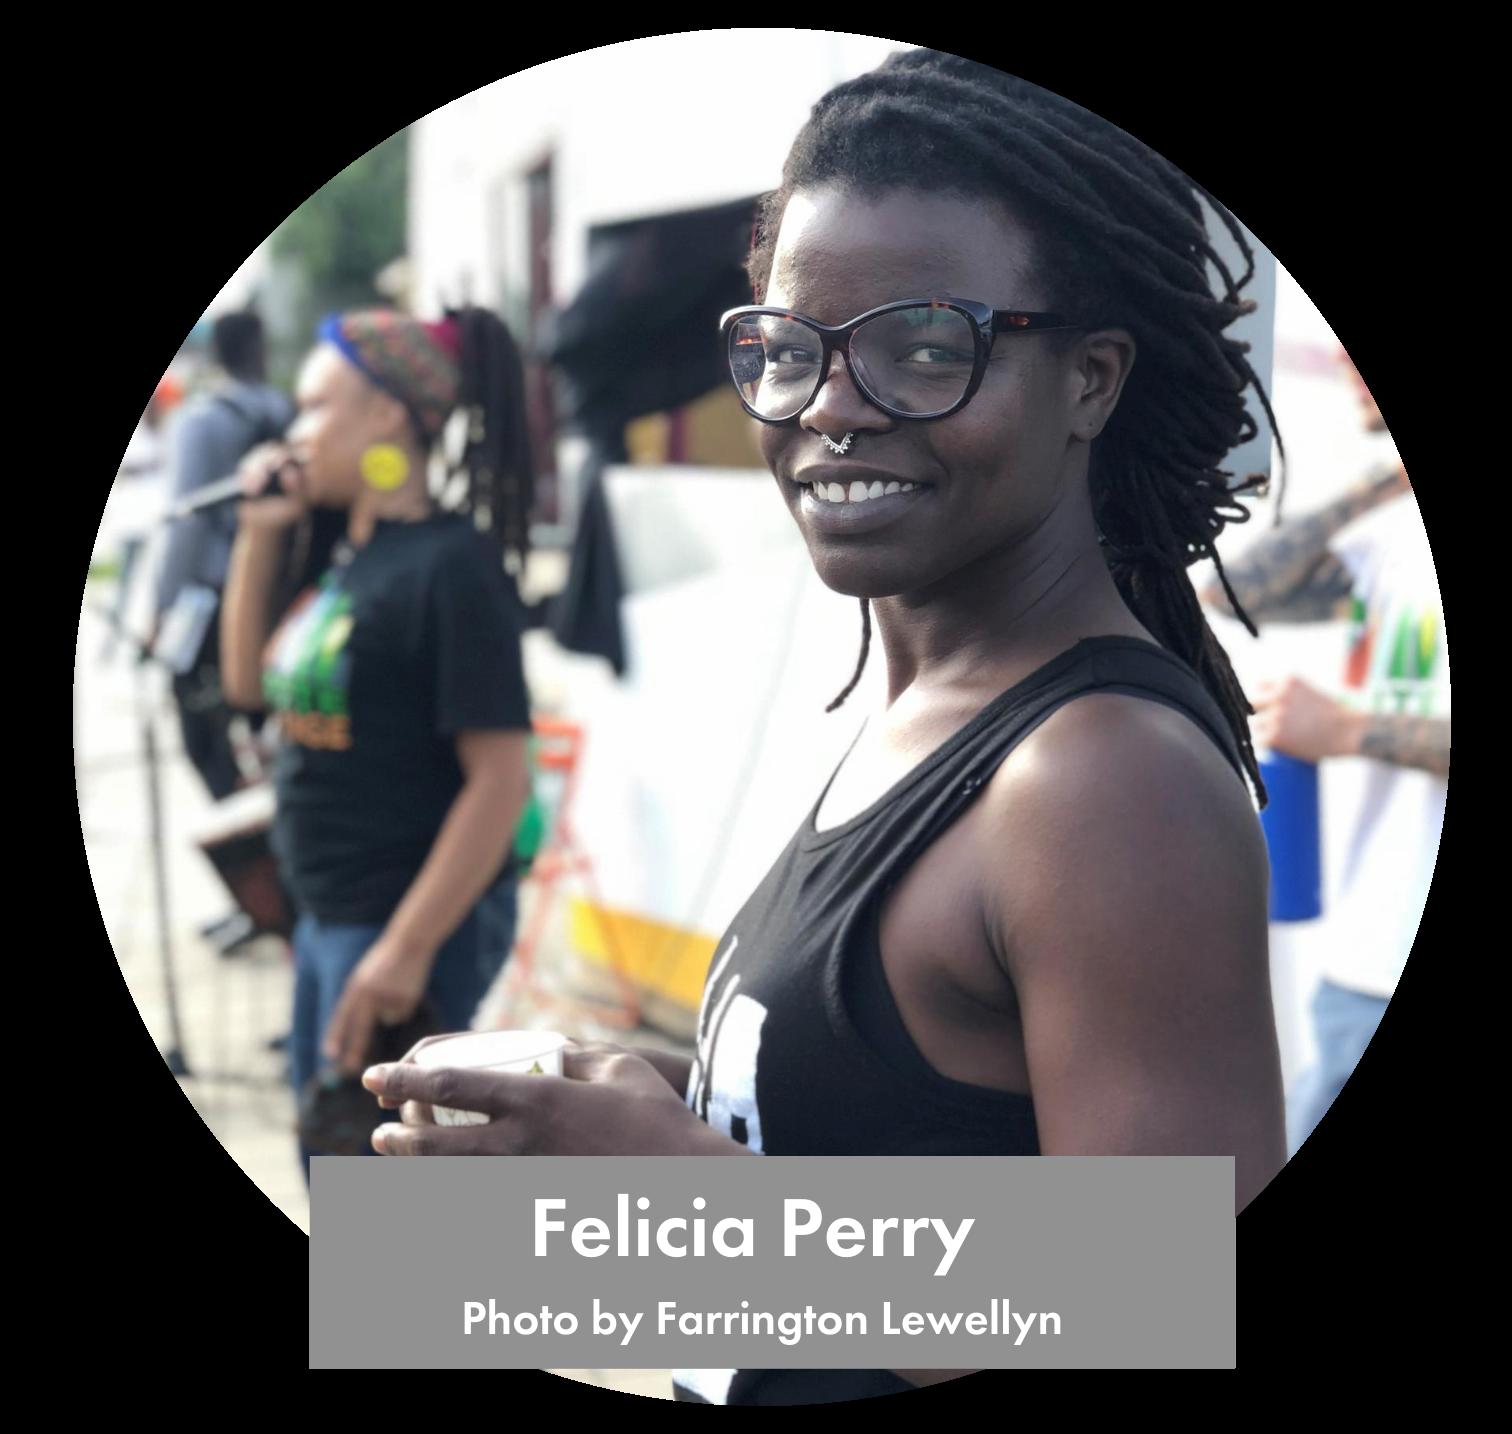 Felicia Perry